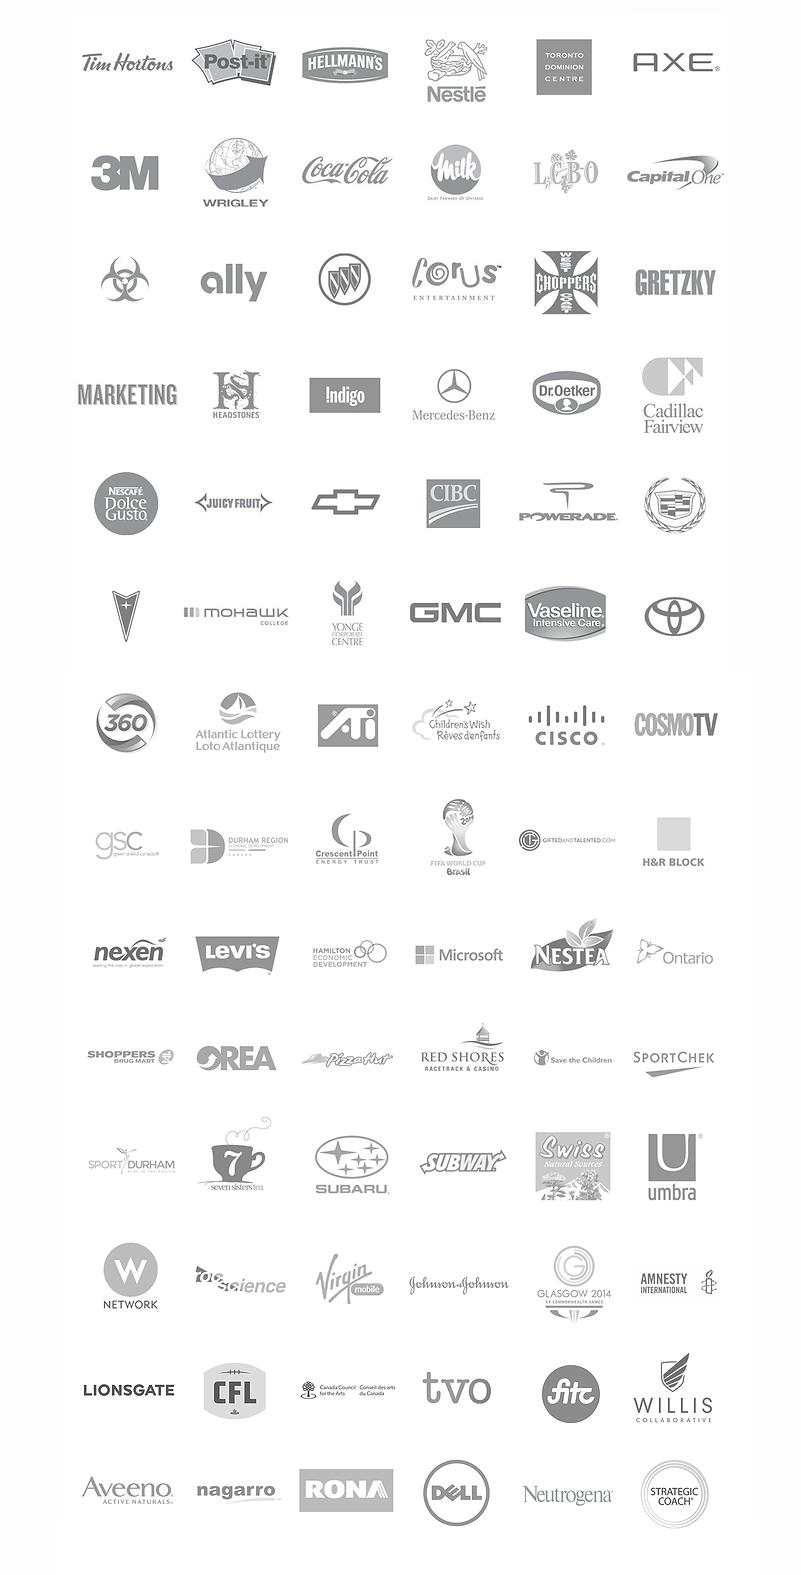 logos_bigger.png